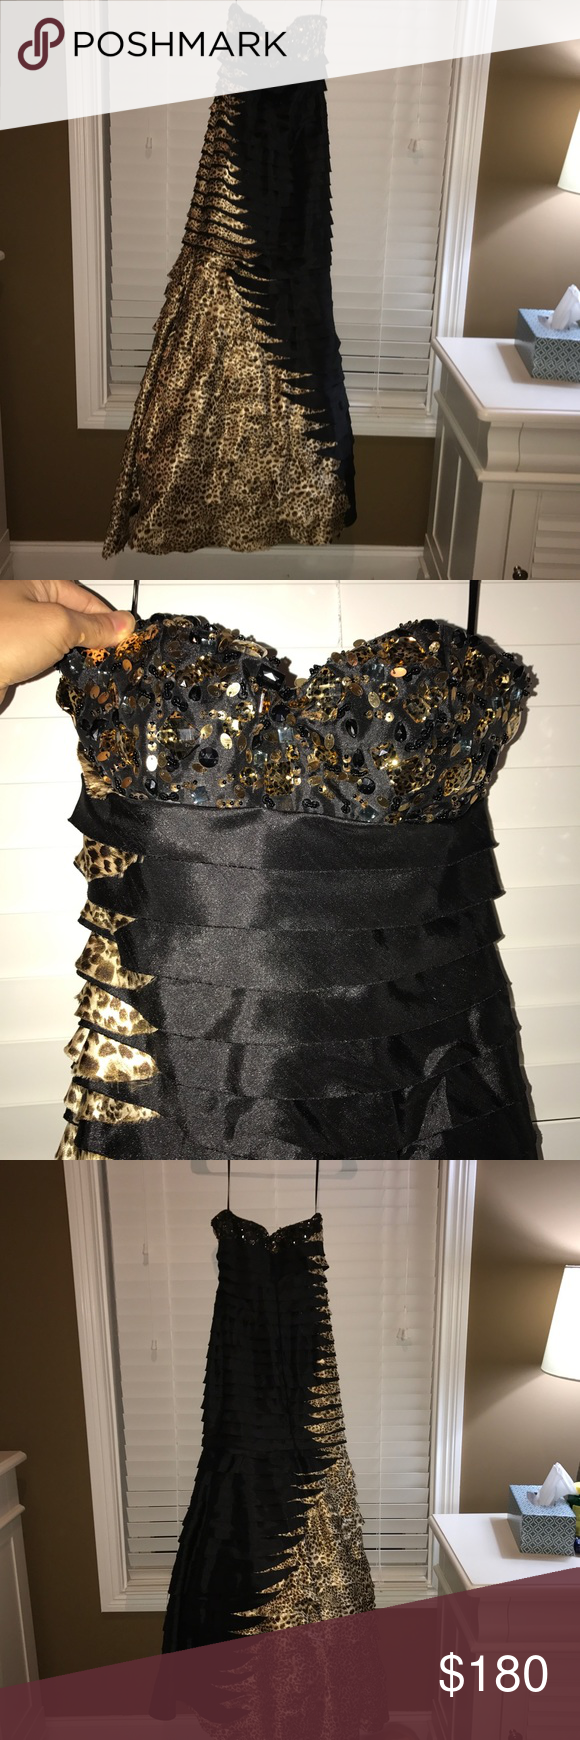 Beautiful black cheetah print prom dress s a l e worn once for